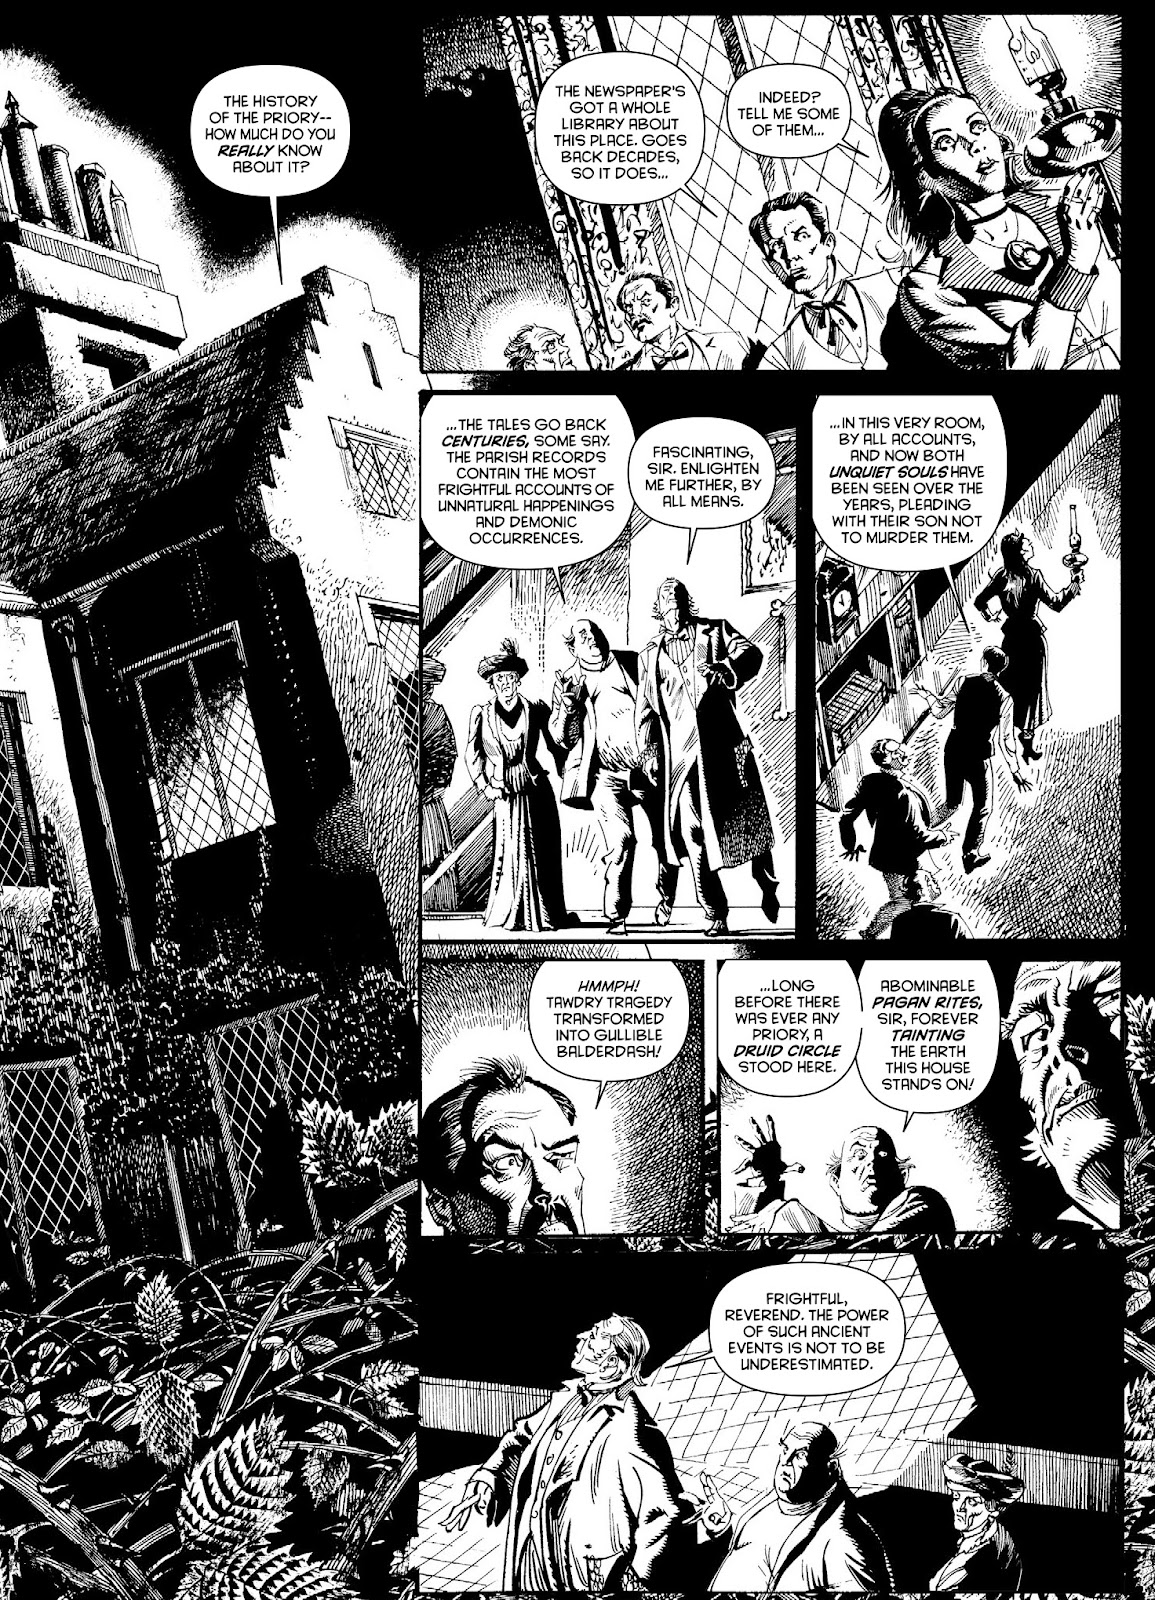 Judge Dredd Megazine (Vol. 5) issue 427 - Page 89